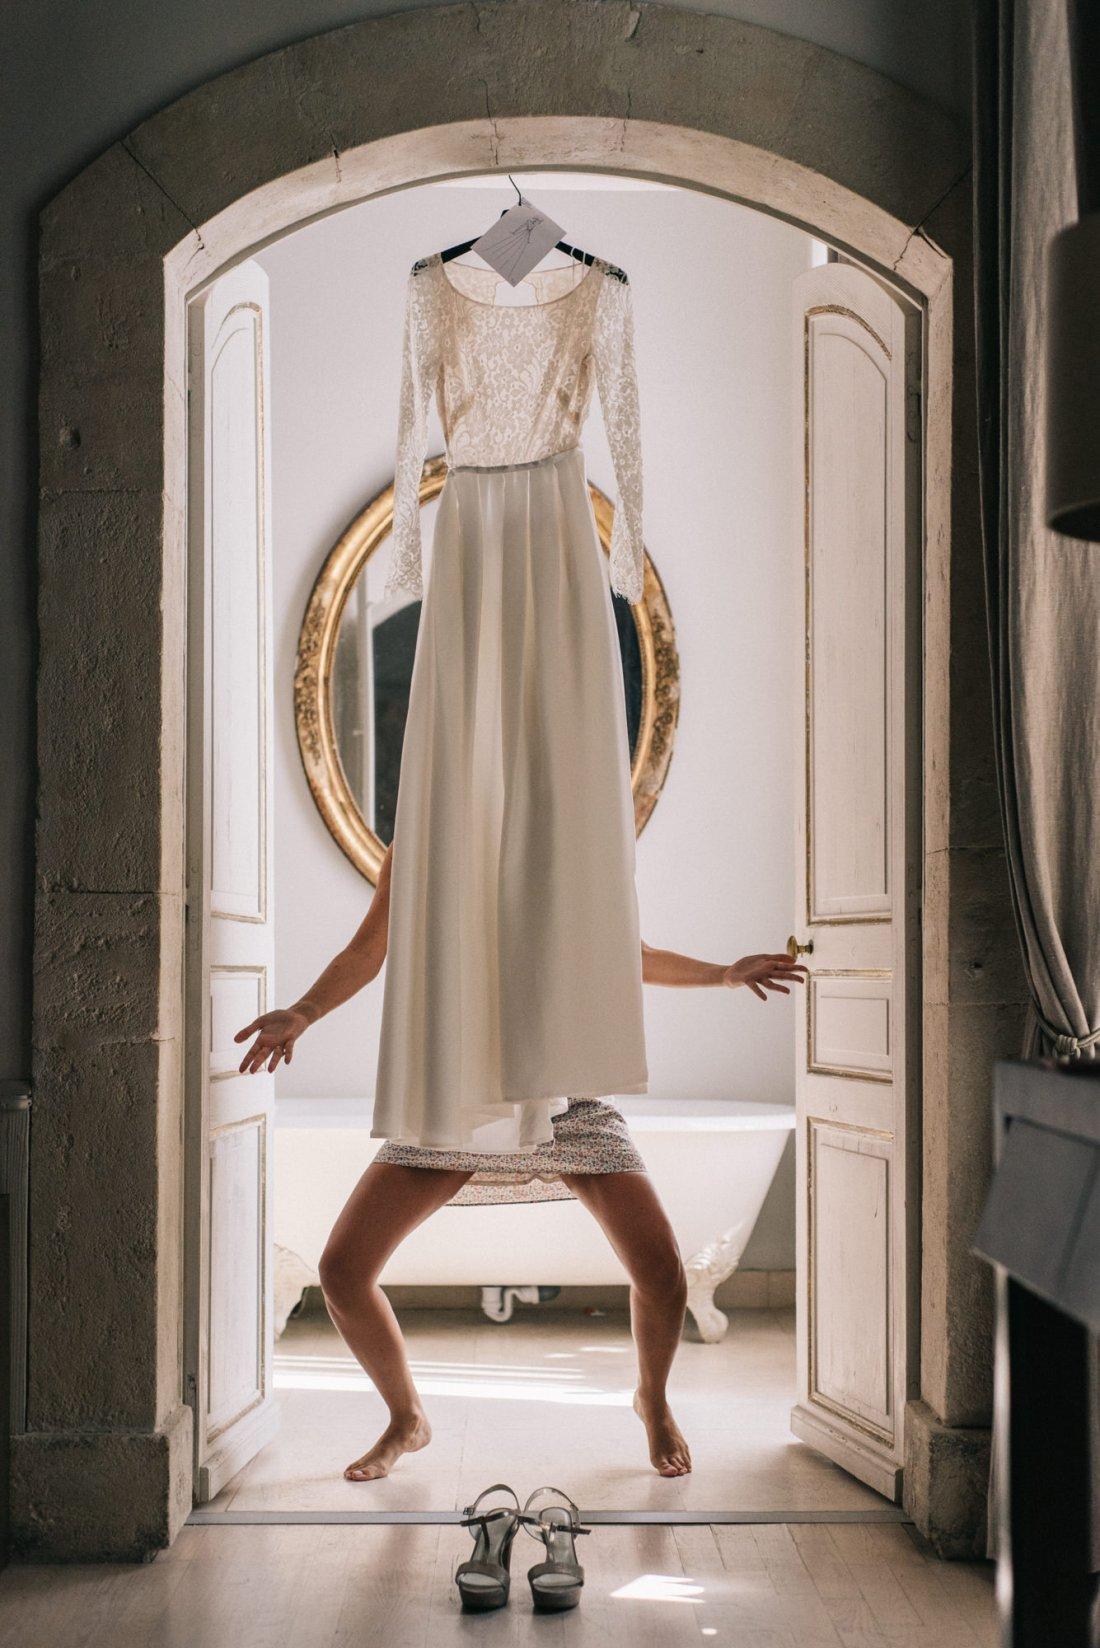 photographe-mariage-paris-angers-nantes-vendee-provence